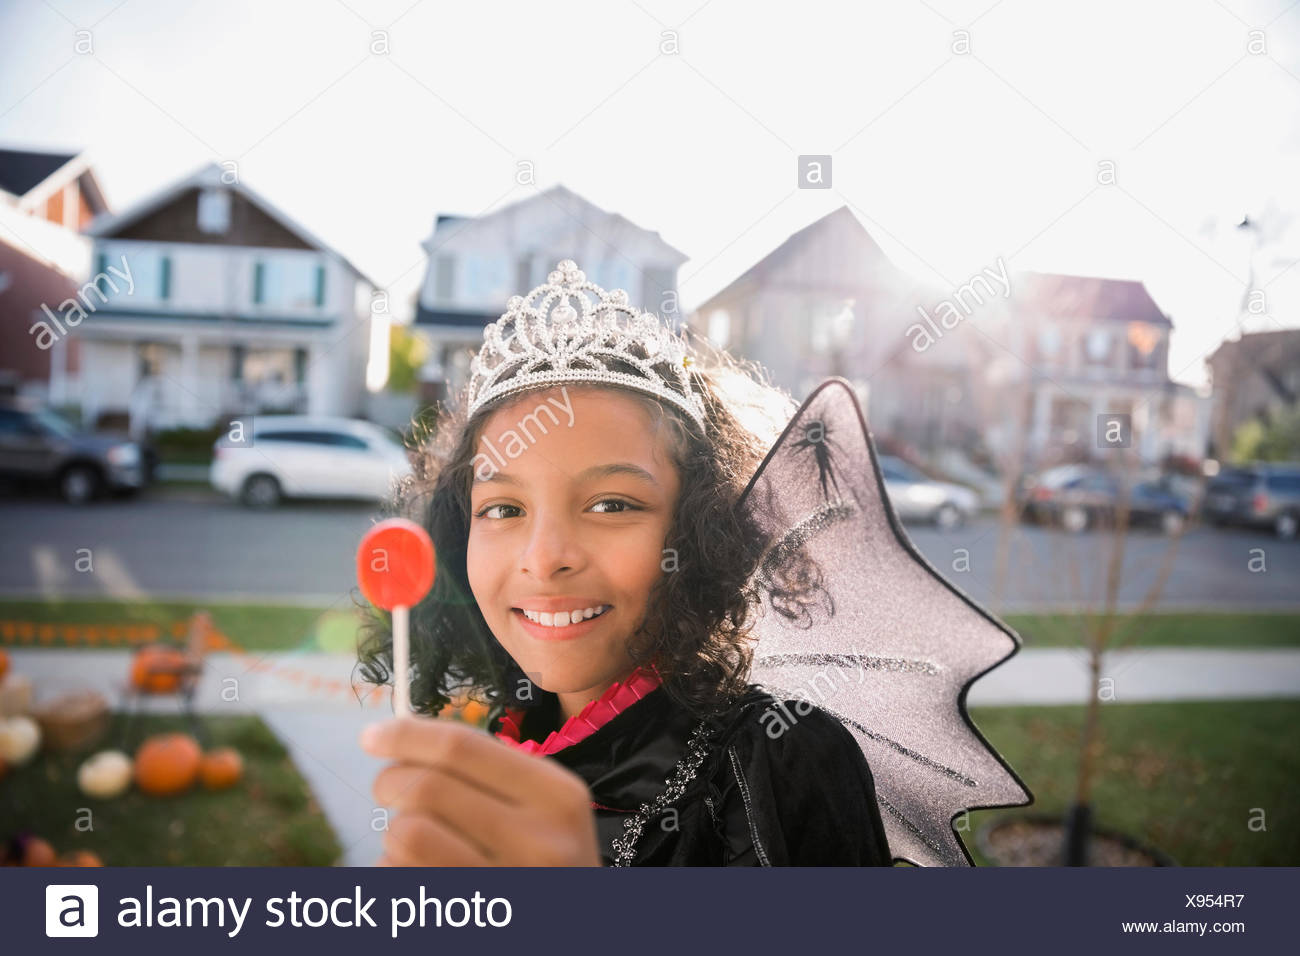 Portrait smiling girl Halloween princess costume enjoying lollipop - Stock Image